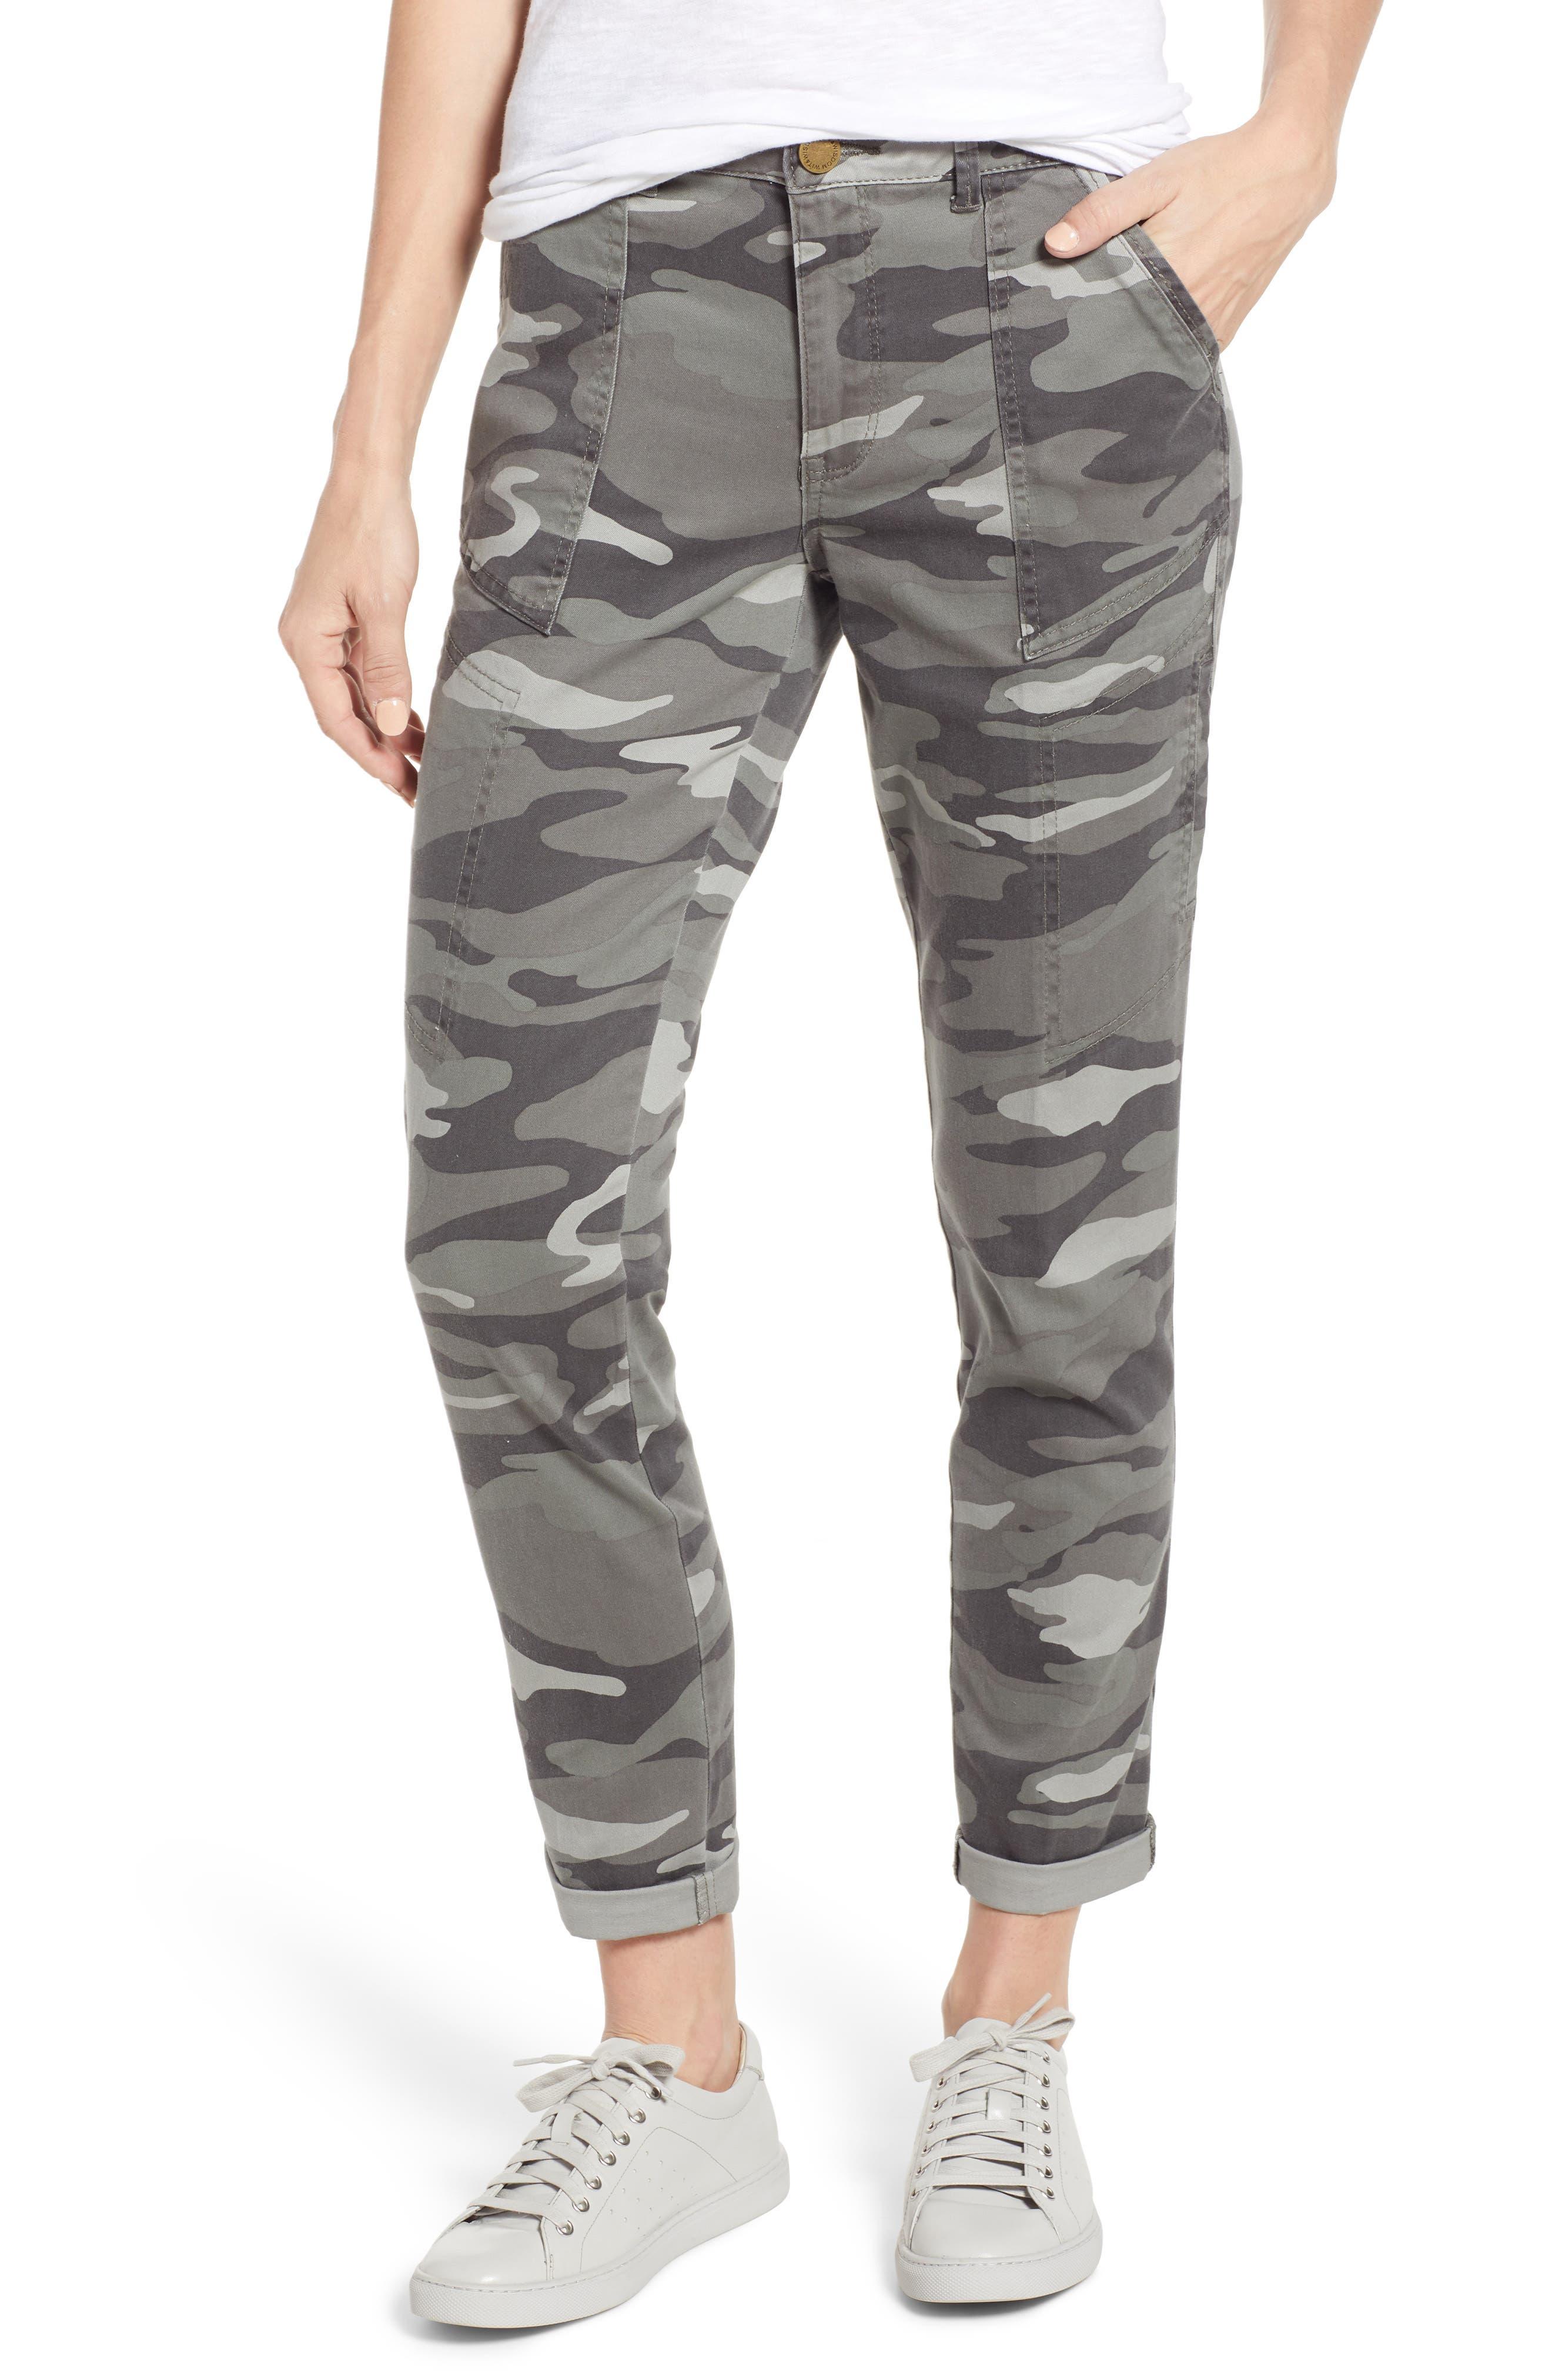 Wit & Wisdom Flex-Ellent Camo High Waist Cargo Pants, Brown